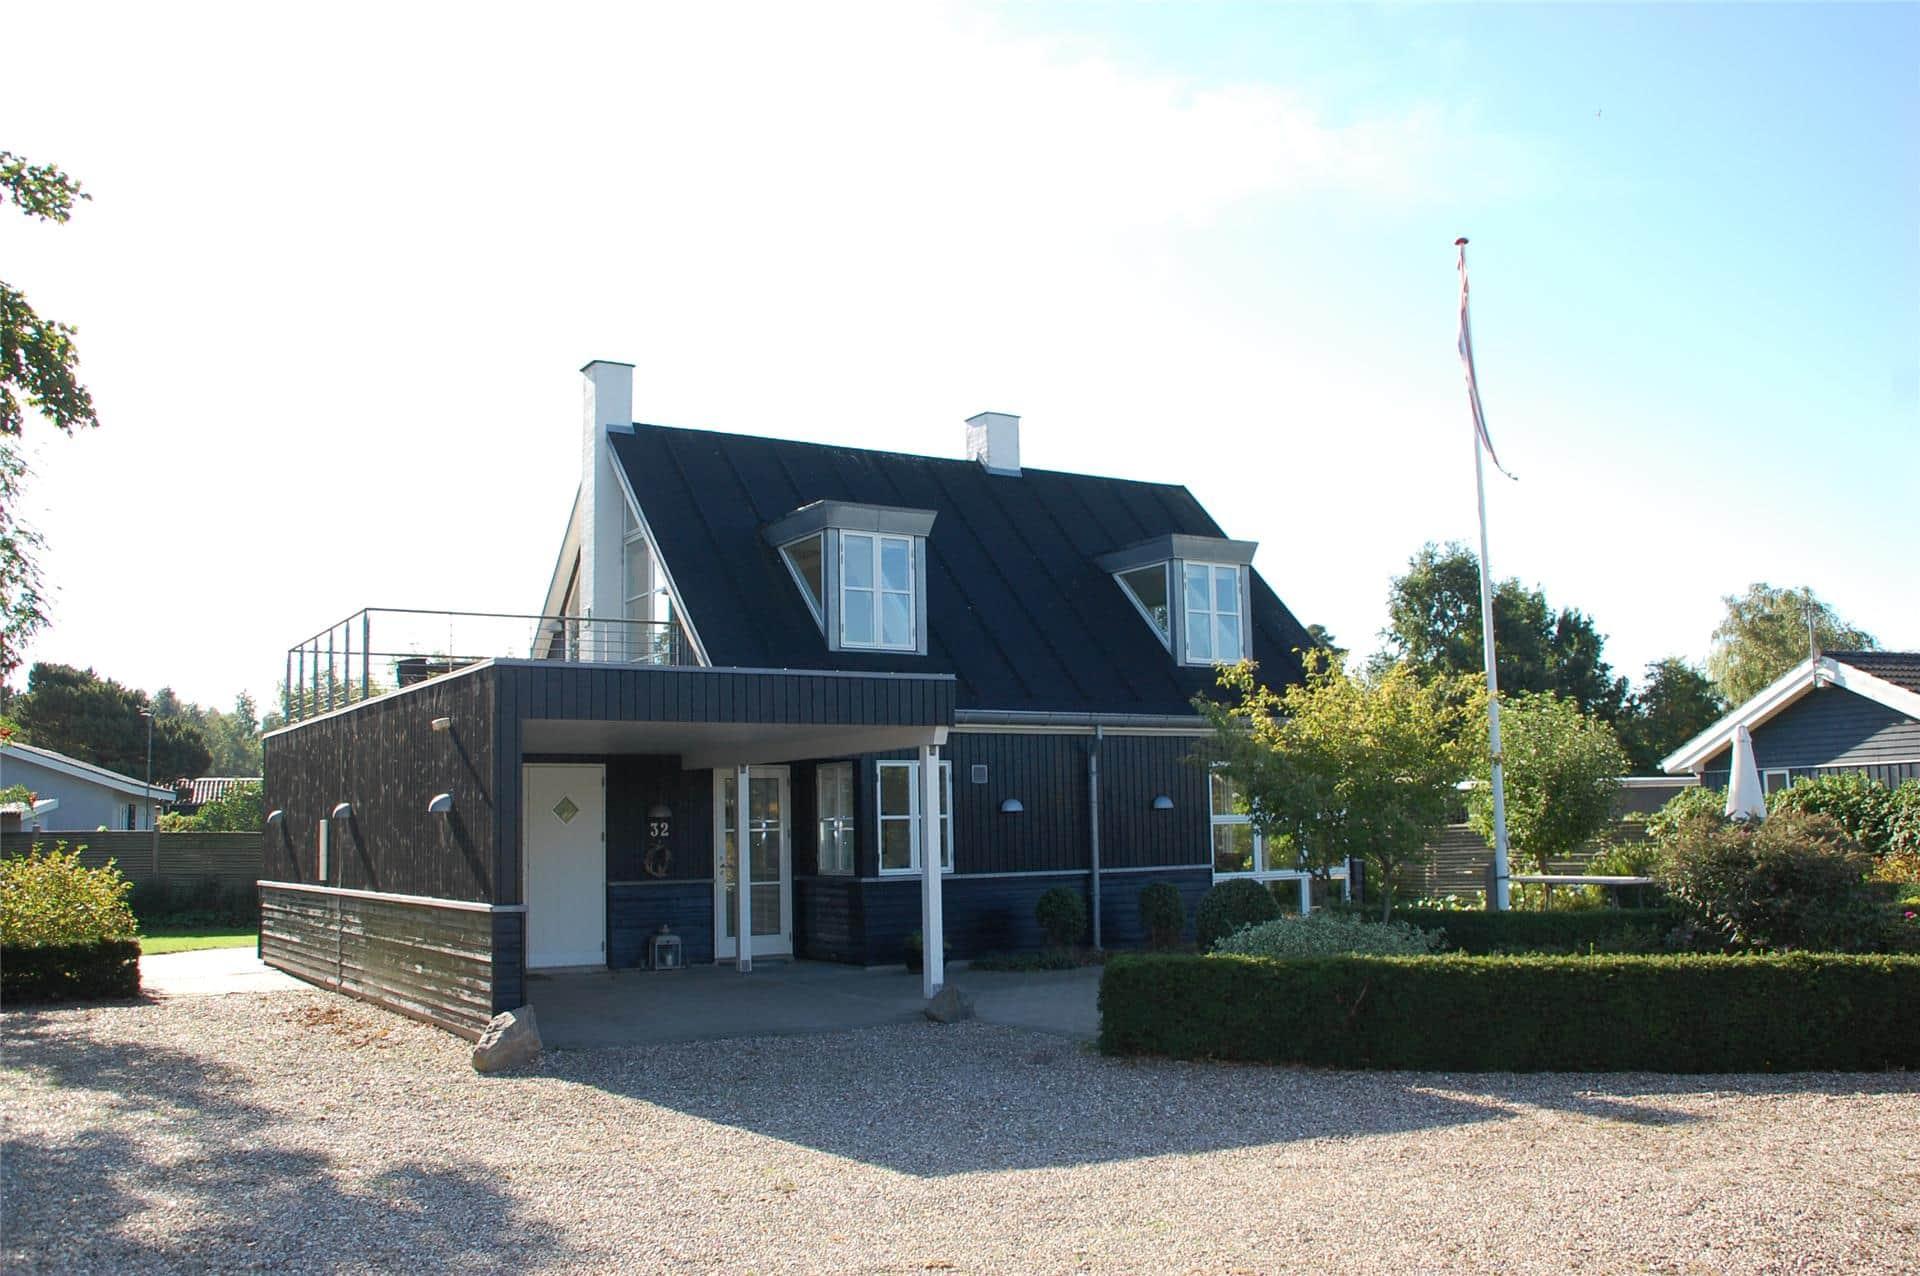 Billede 1-3 Sommerhus M64232, Capellavej 32, DK - 5500 Middelfart